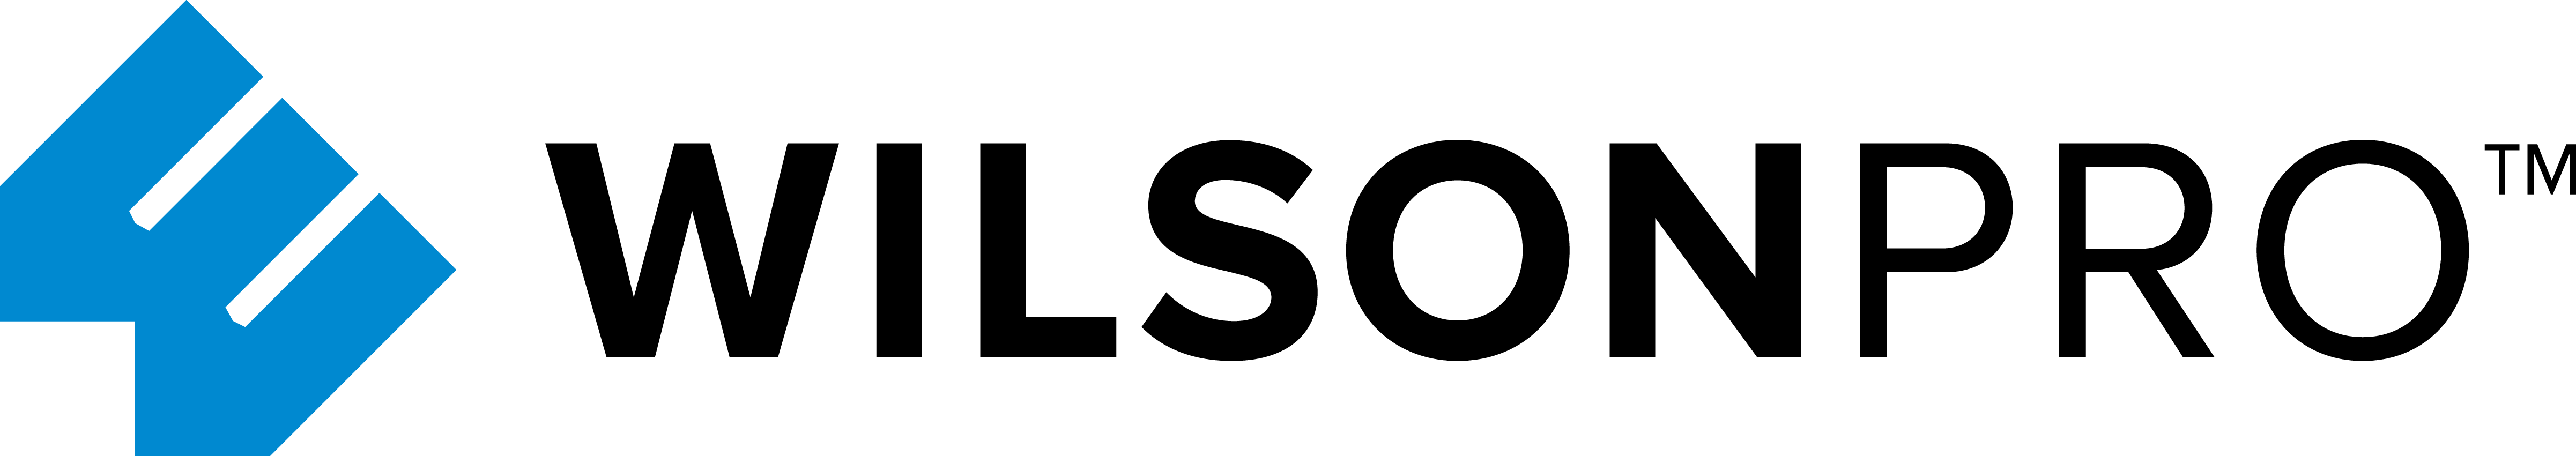 WilsonPro Logo - Copy